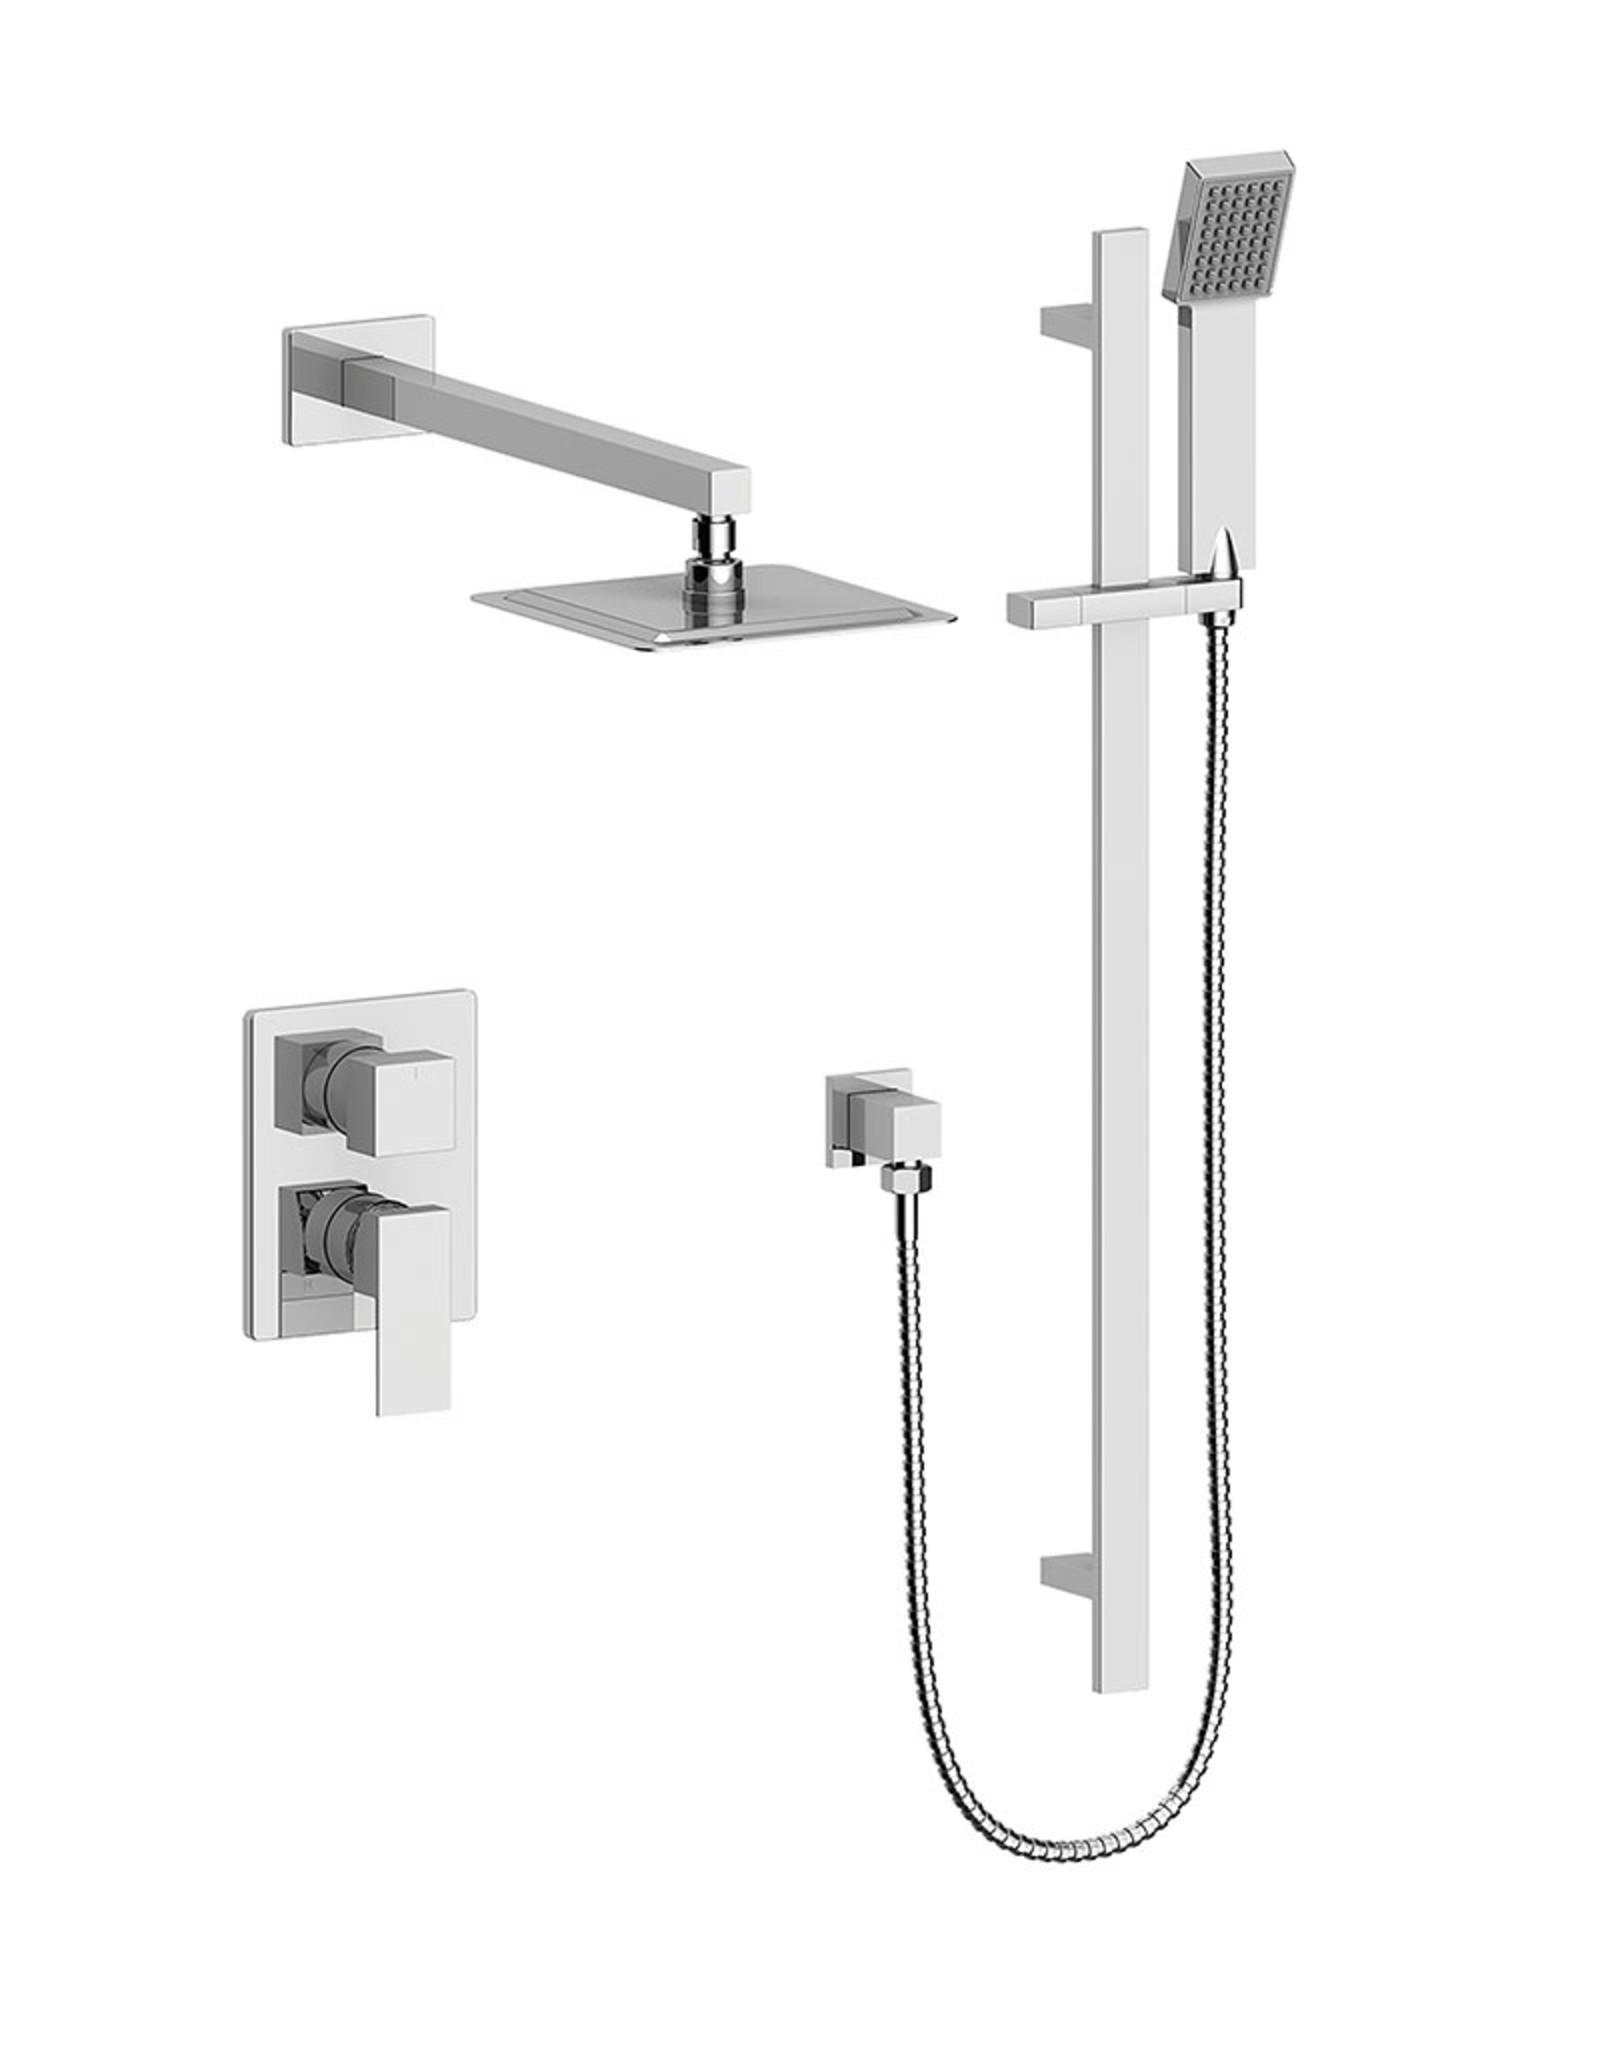 Vogt Kapfenberg- 2-Way Pressure Balanced Shower Kit- Handheld With Rainhead- Chrome